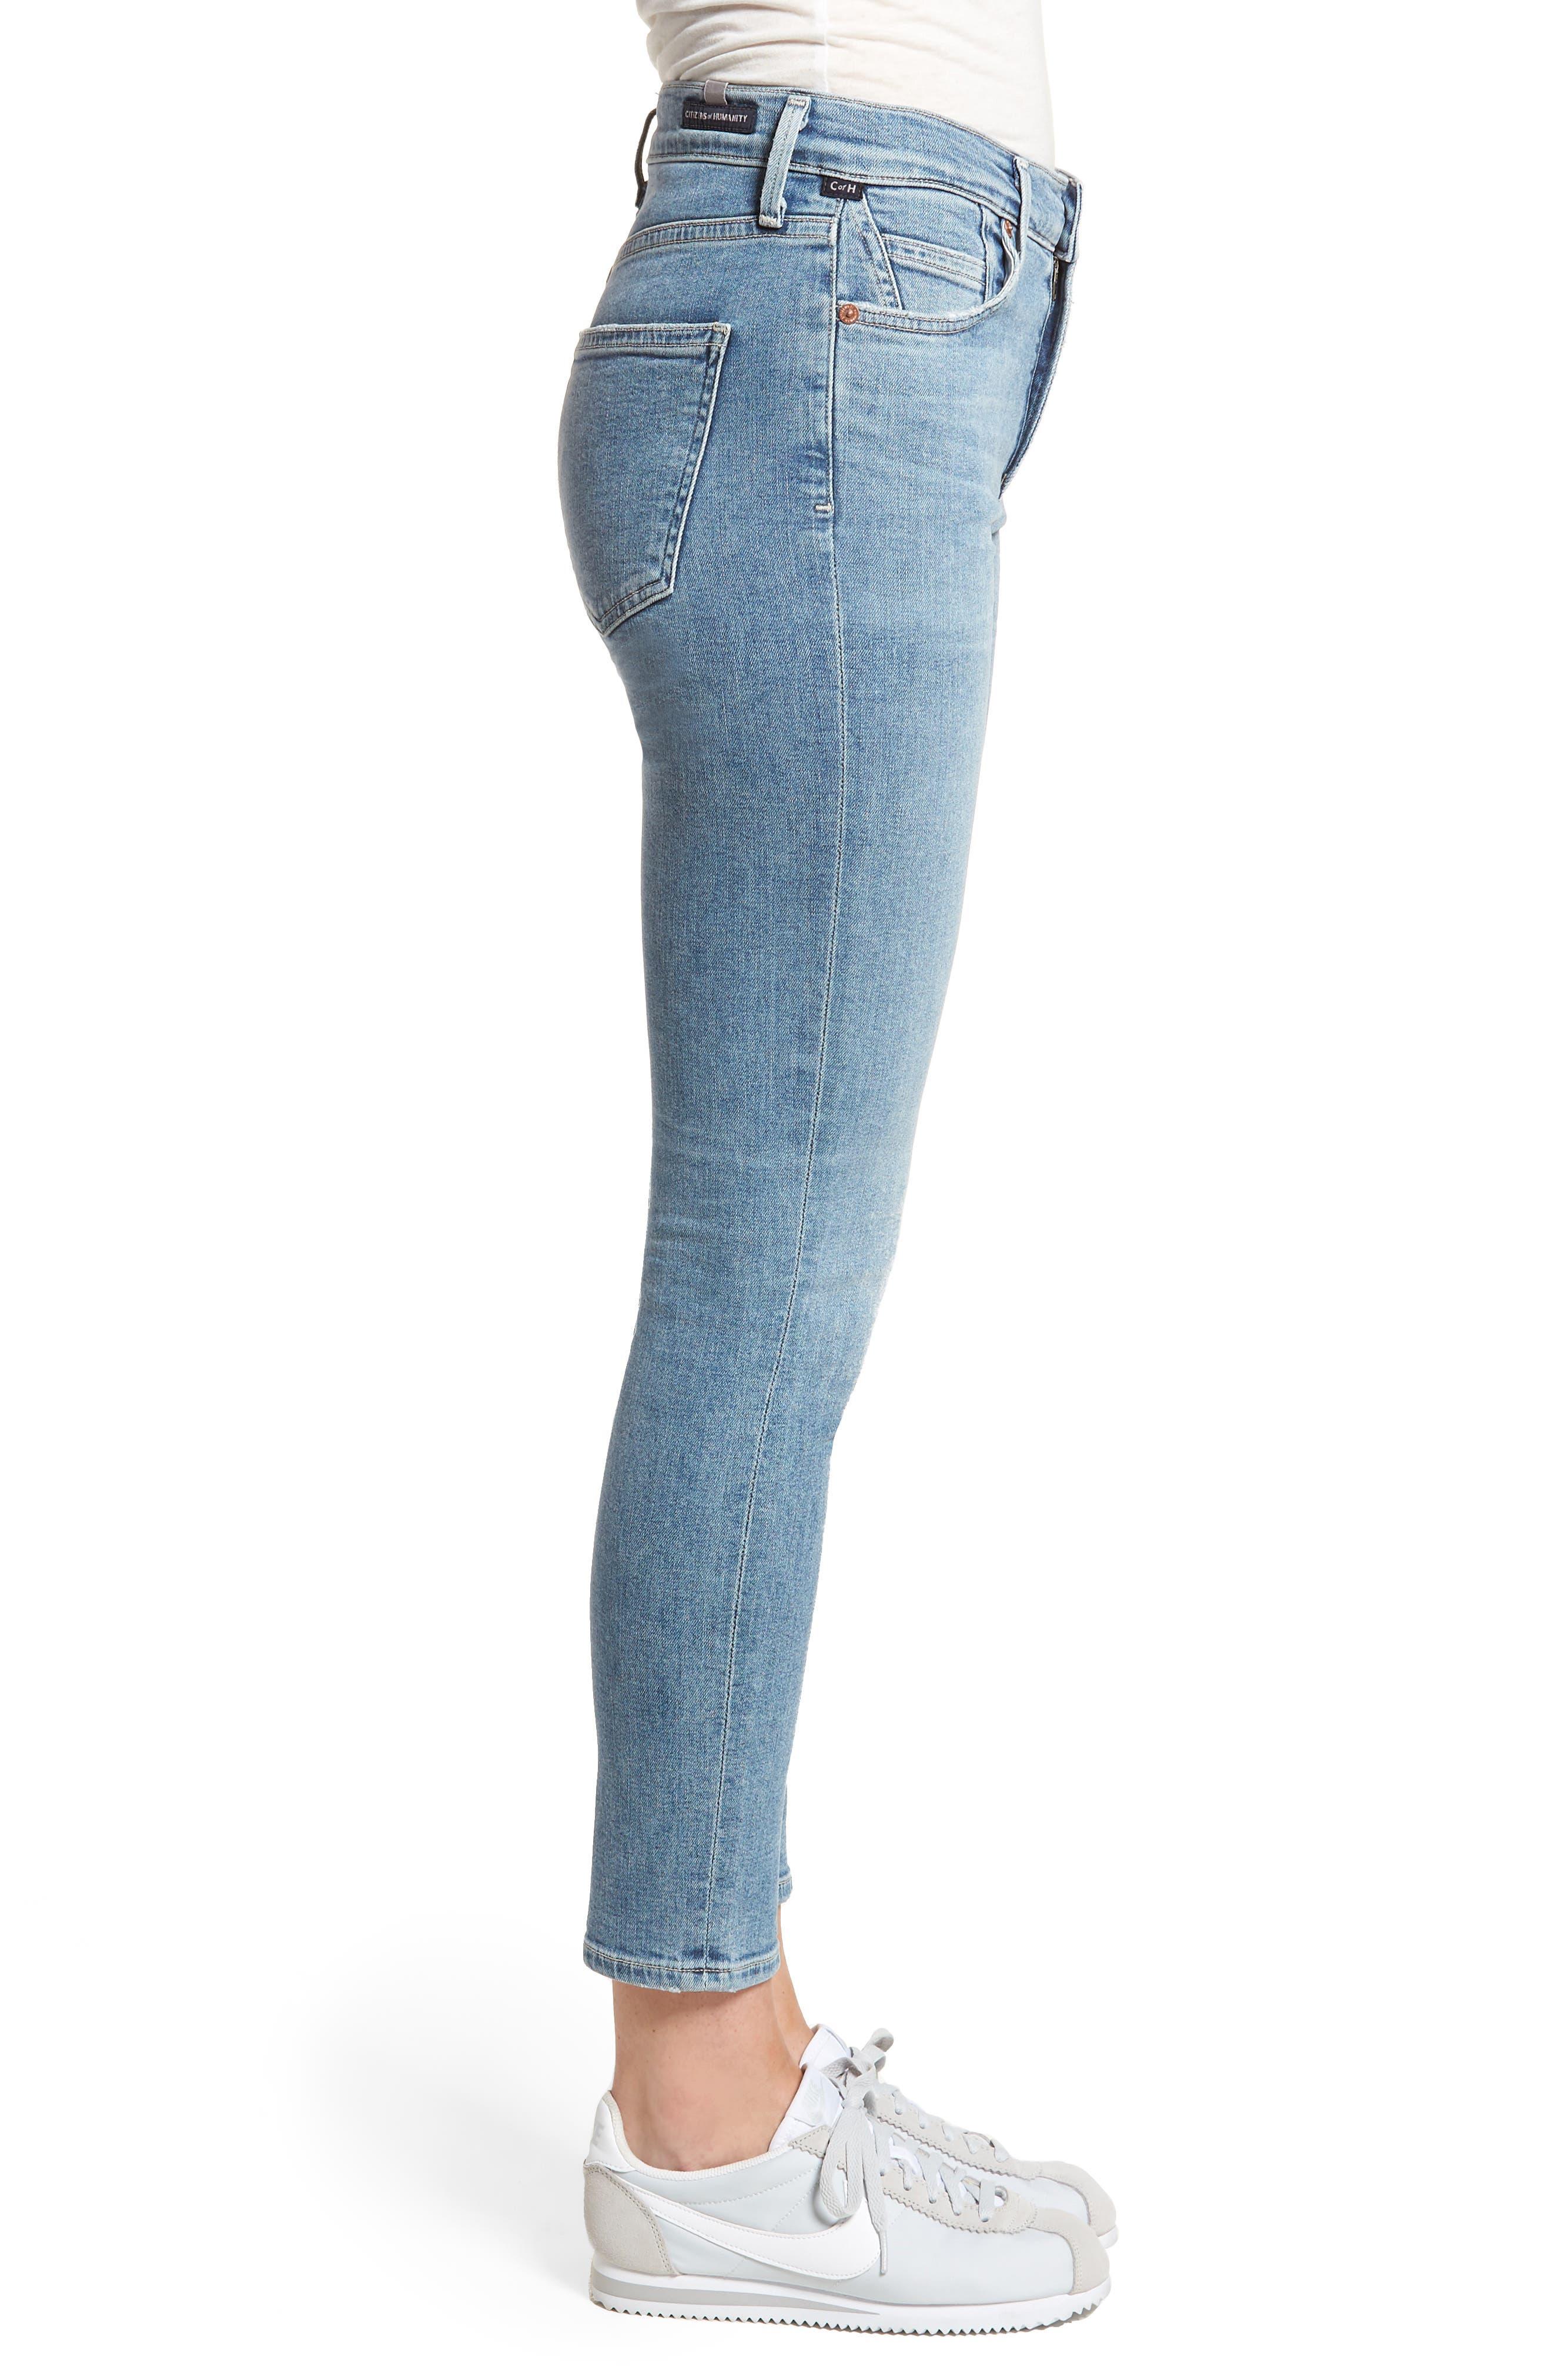 Rocket High Waist Crop Skinny Jeans,                             Alternate thumbnail 3, color,                             457